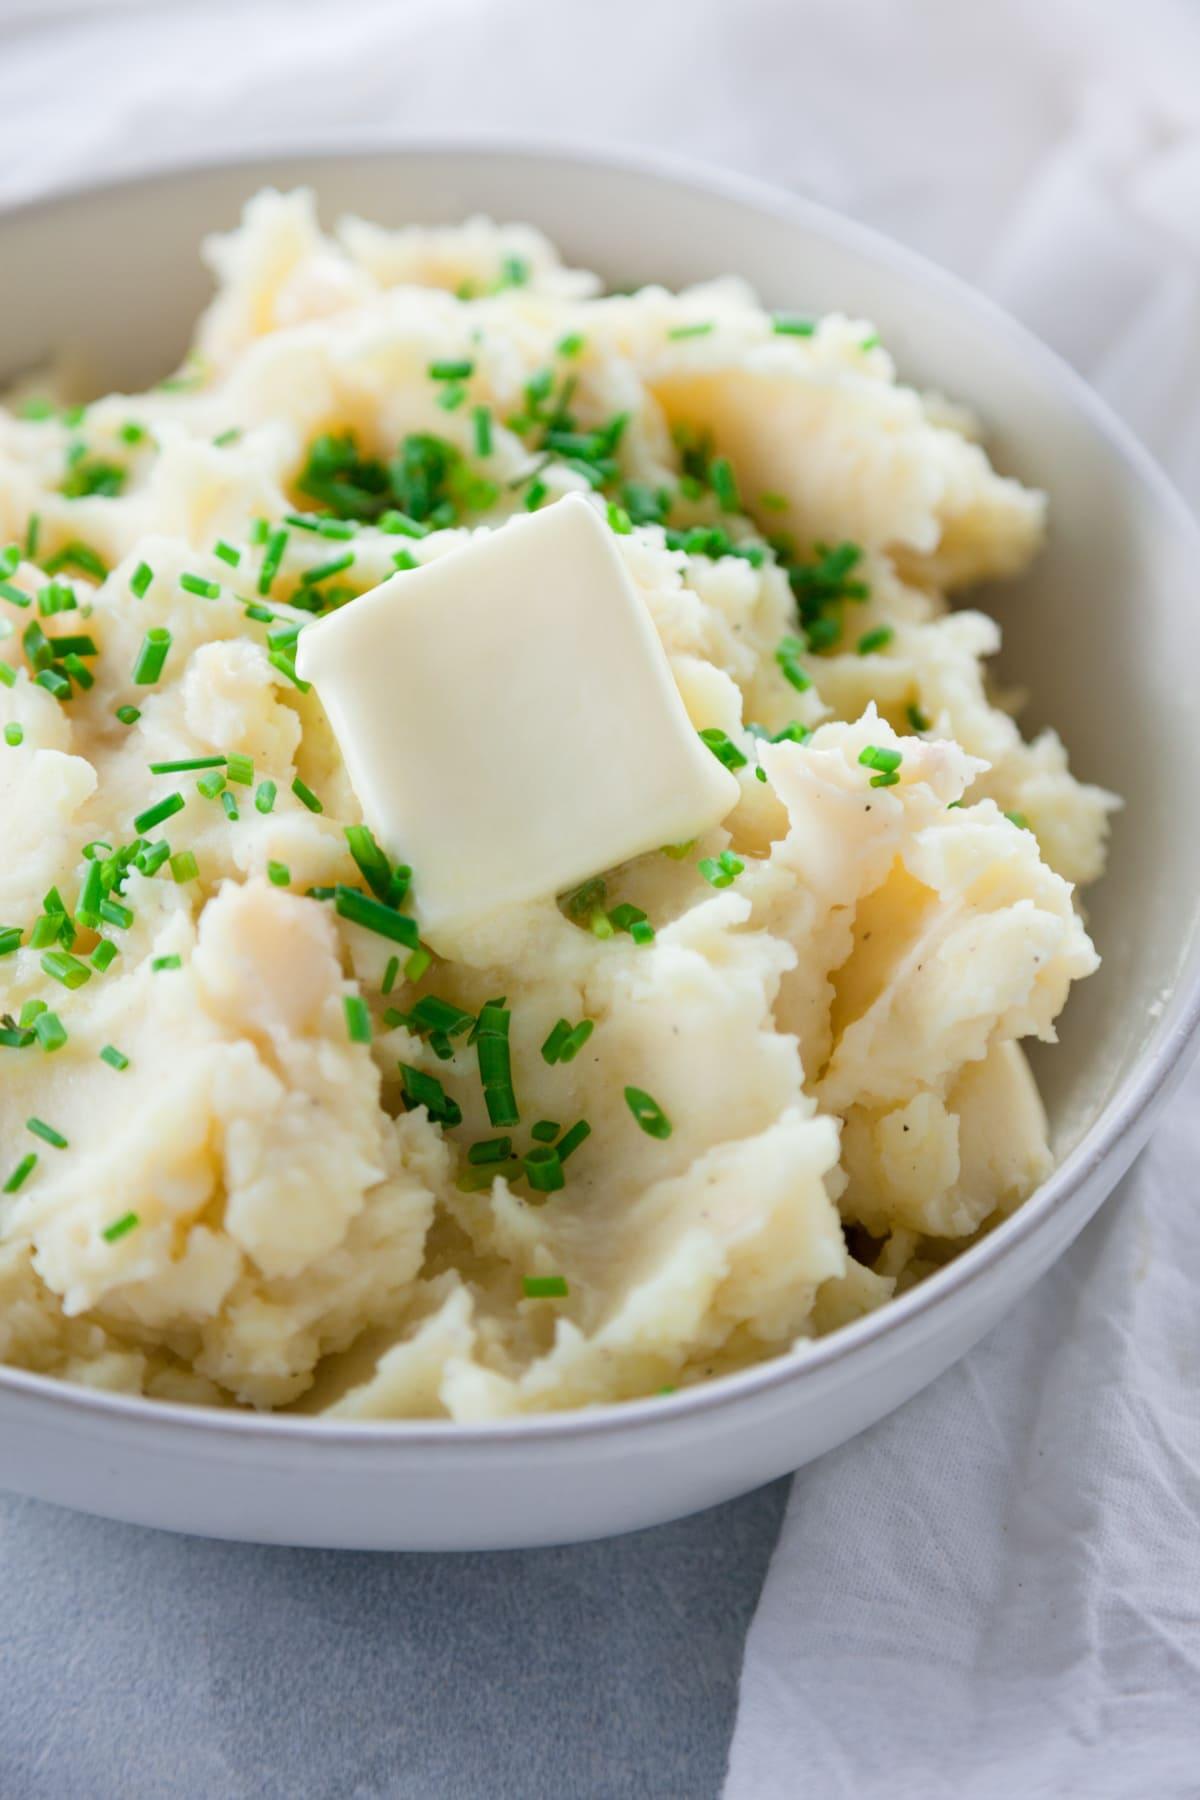 Garlic Chive Mashed Potatoes